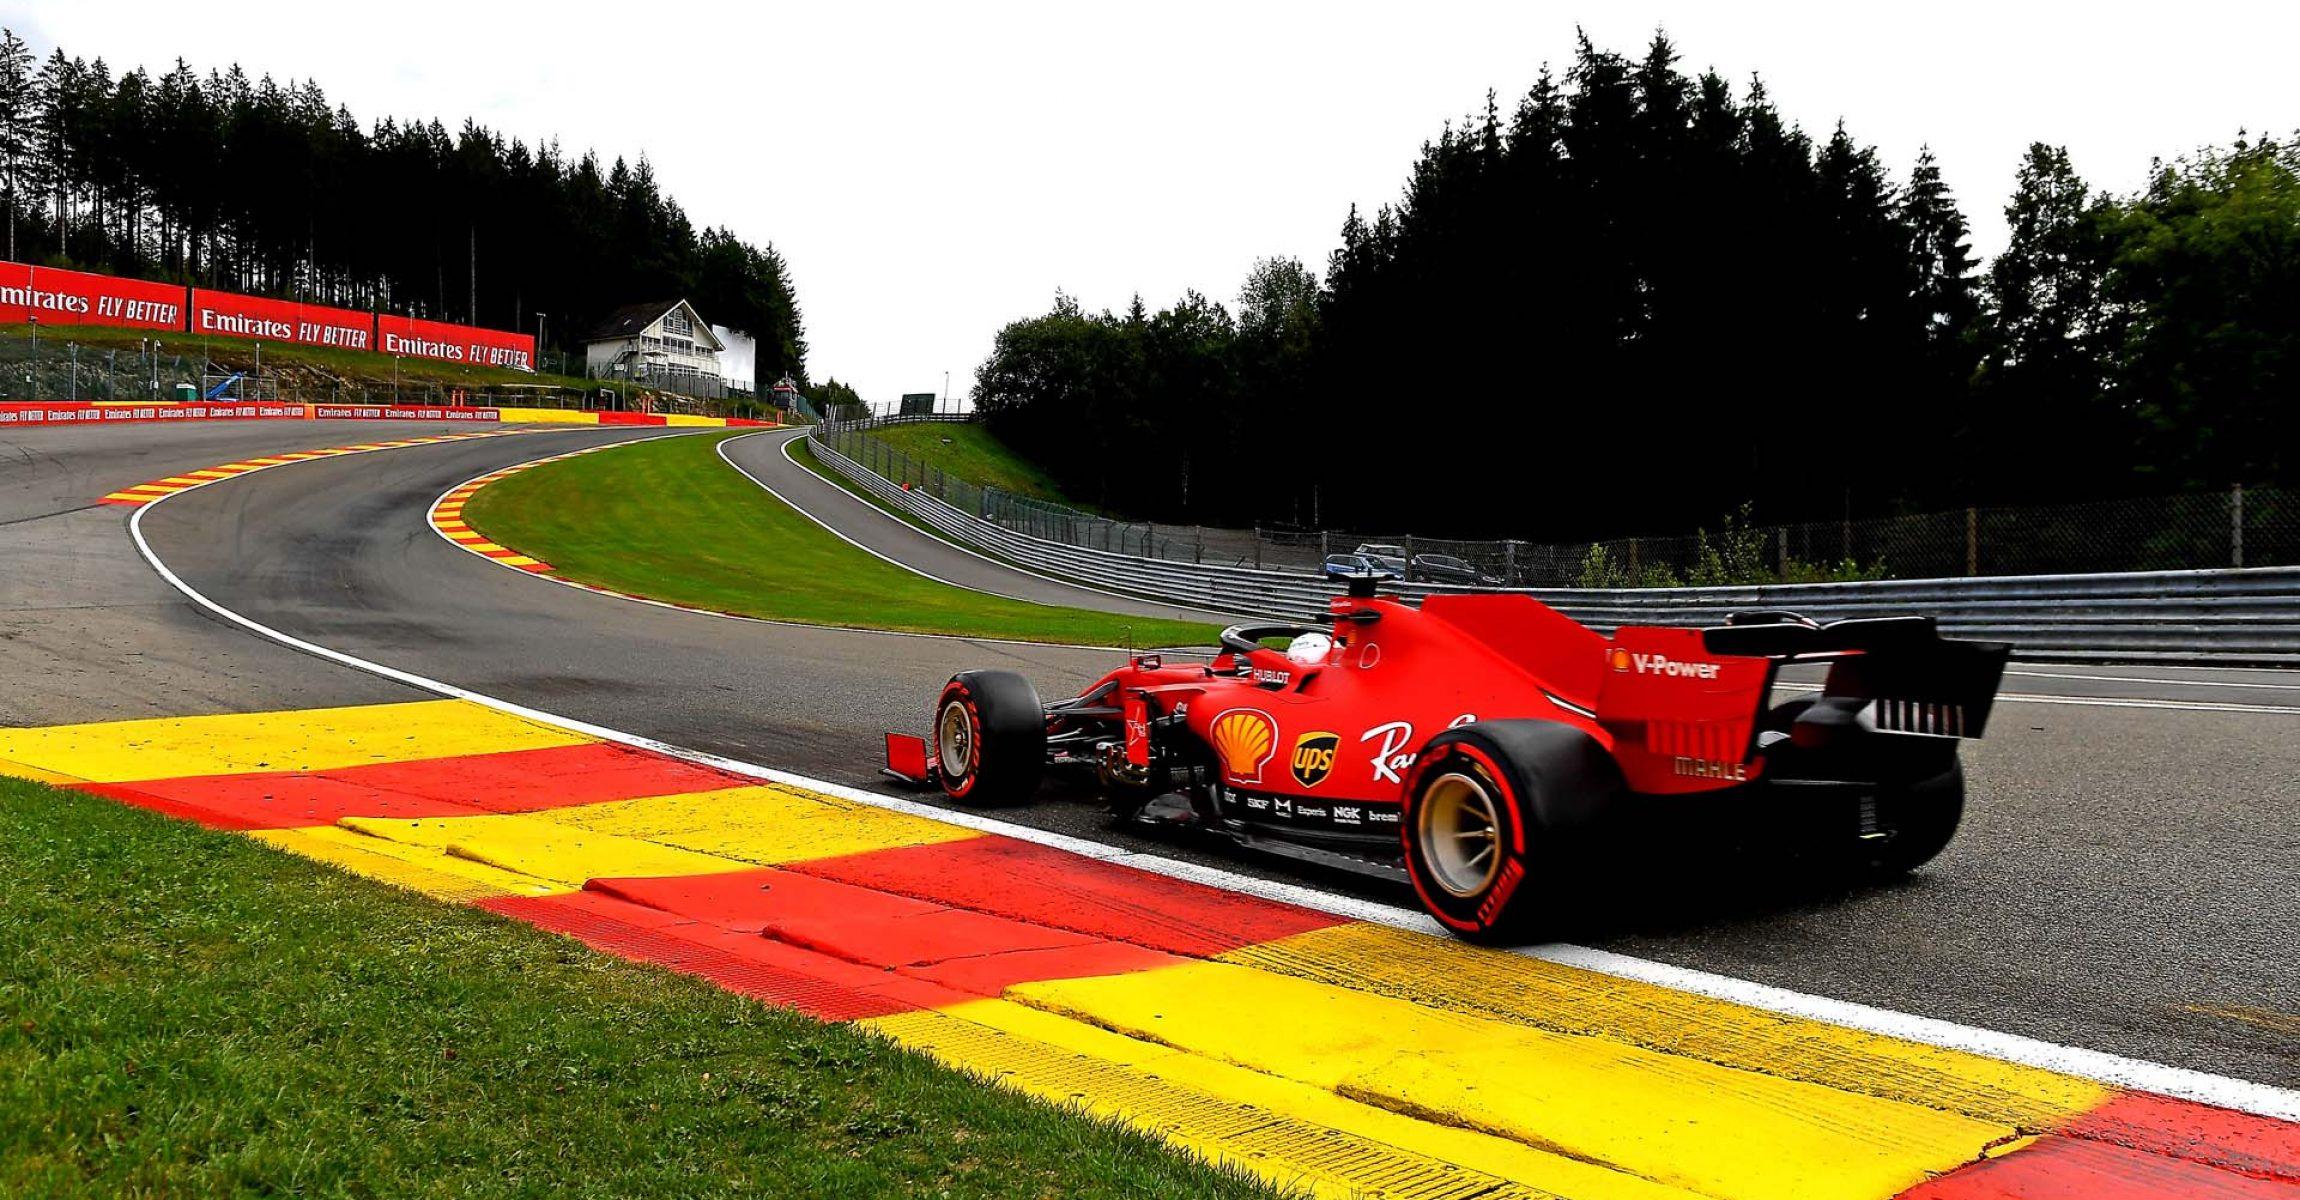 GP BELGIO F1/2020 -  VENERDÌ 28/08/2020   credit: @Scuderia Ferrari Press Office Sebastian Vettel